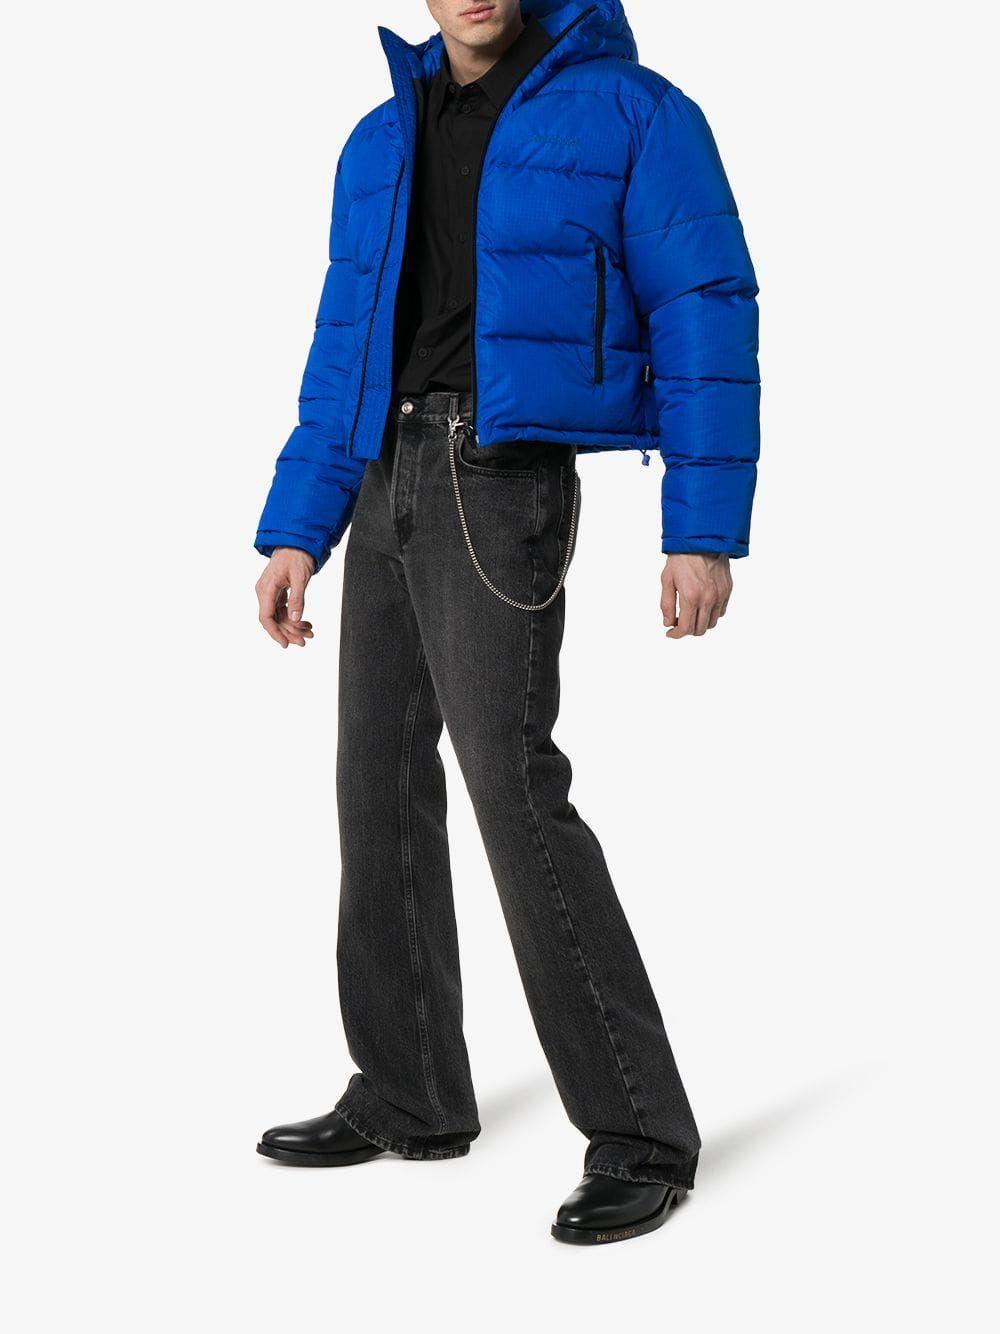 Balenciaga Balenciaga Cropped Hooded Puffer Jacket Balenciaga Cloth Jackets Puffer Jackets Cropped Puffer Jacket [ 1334 x 1000 Pixel ]